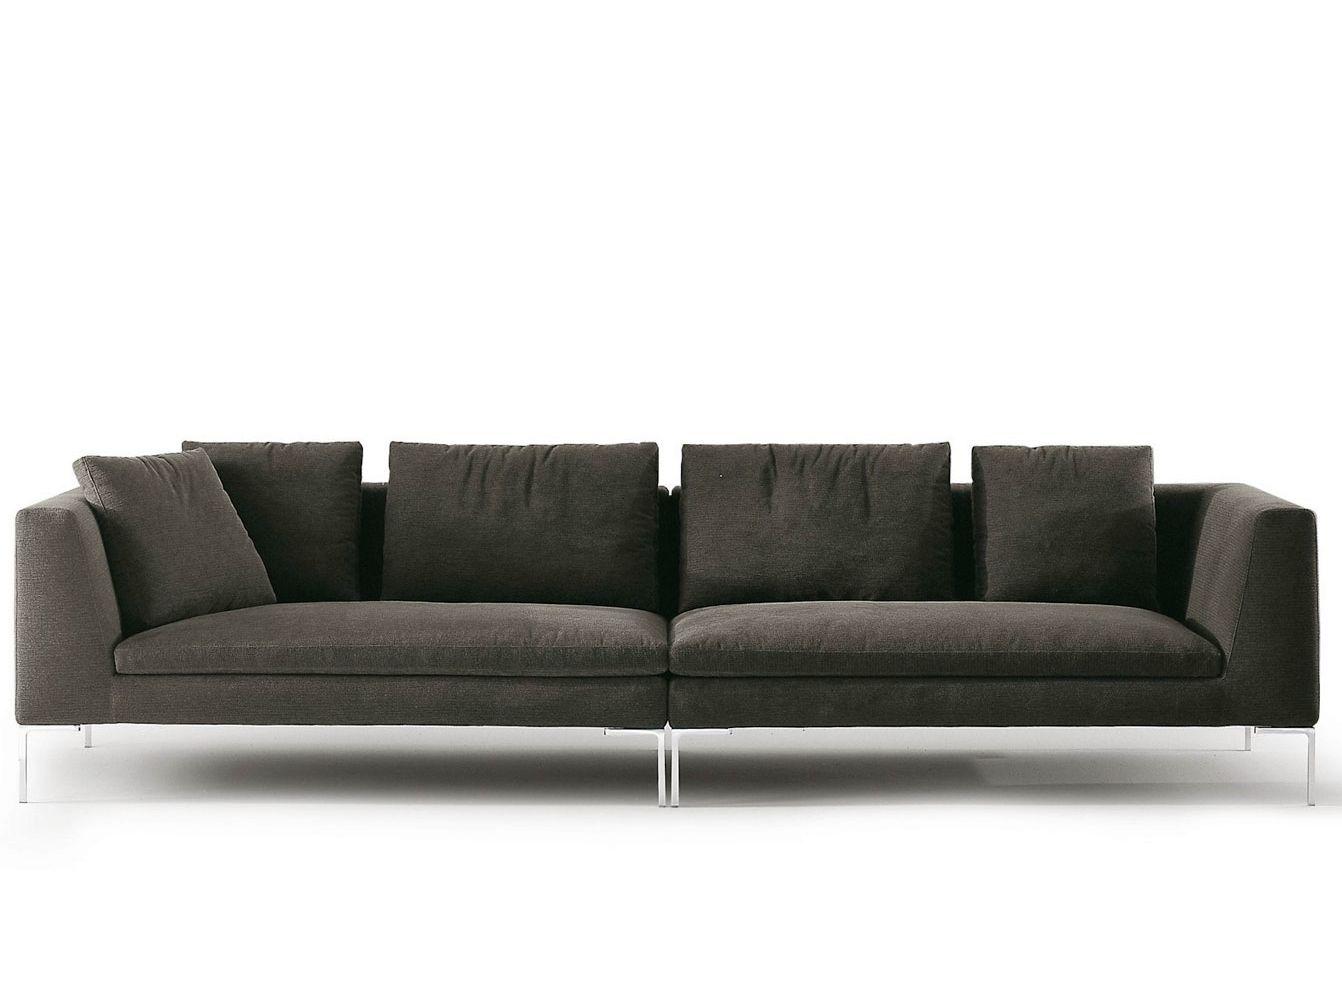 b&b italia divano charles - Cerca con Google | Lisa living room ...